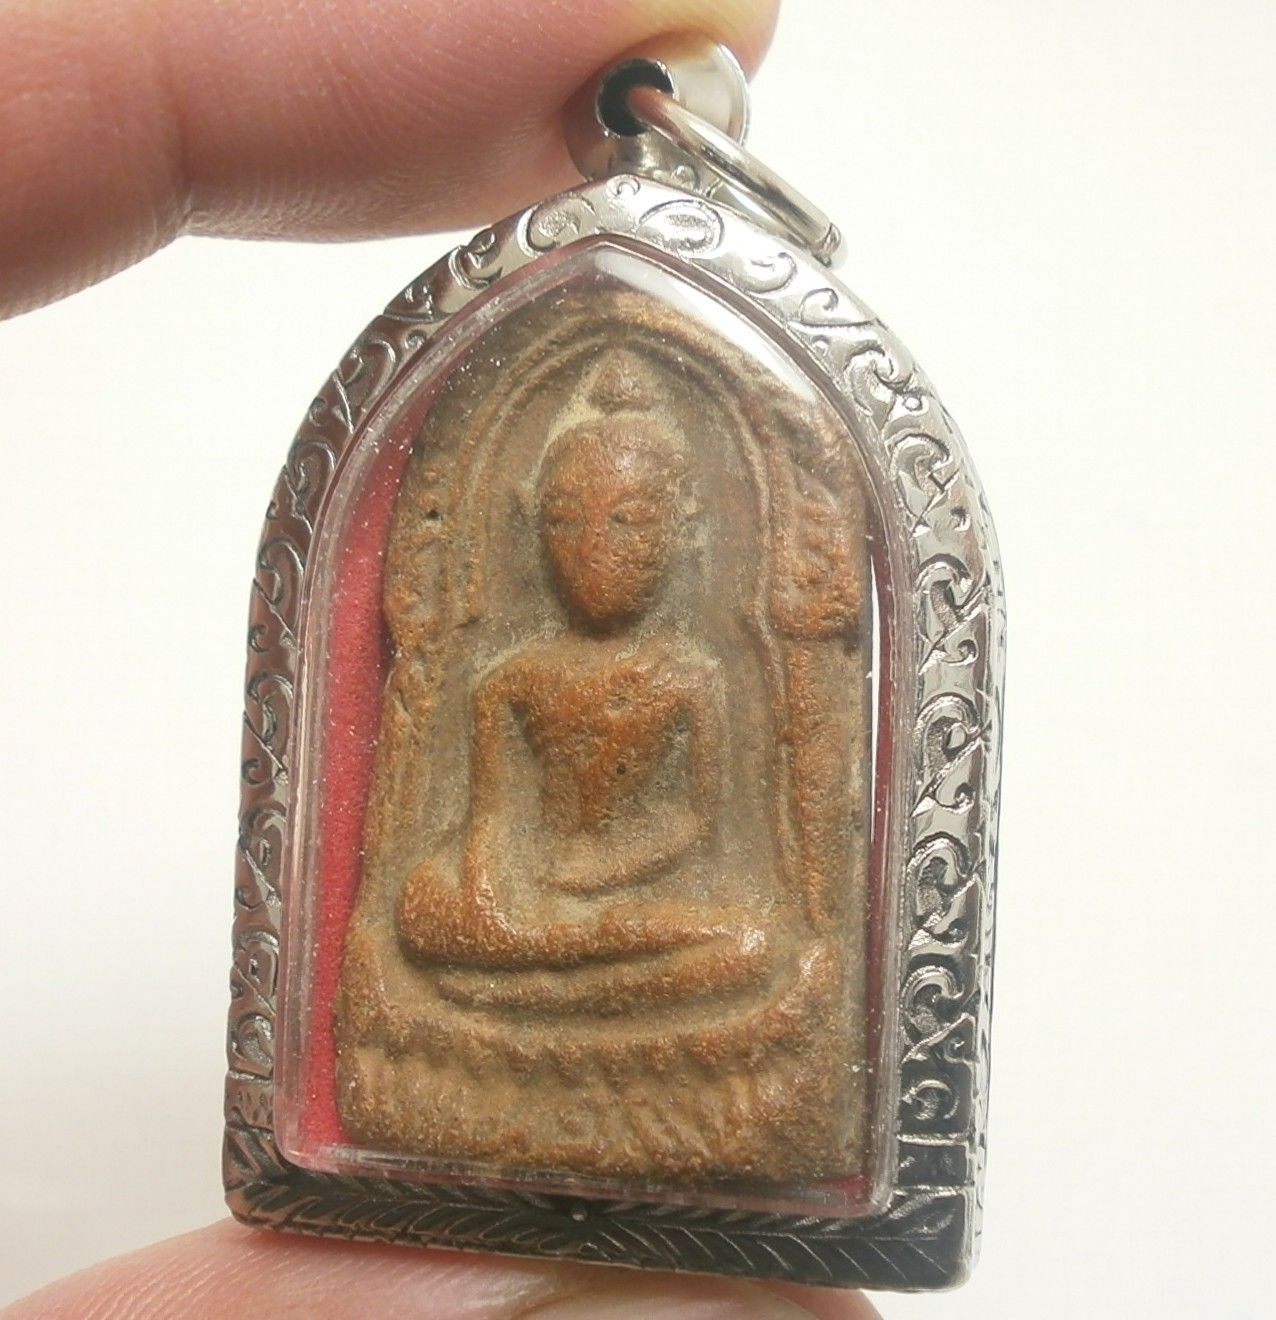 PHRA SOOMGOR MONEY RICH LUCKY HAPPY PEACEFUL LIFE THAI BUDDHA TOP AMULET PENDANT image 3